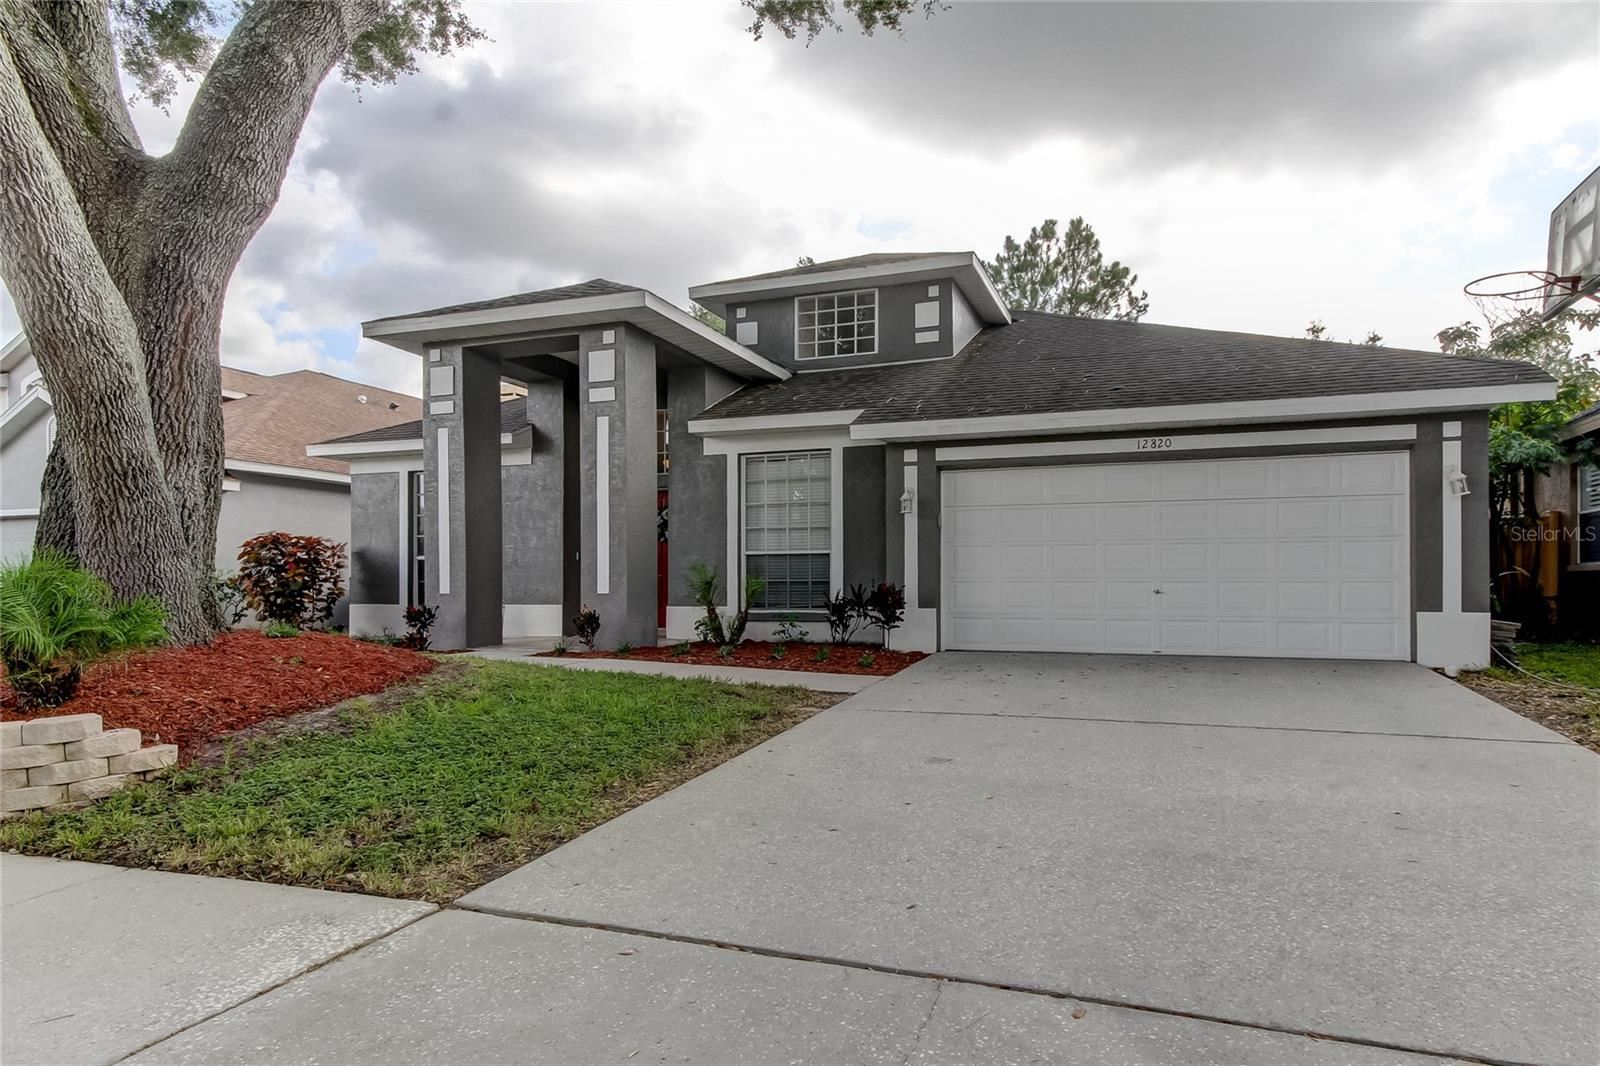 12820 BIG SUR DR, Tampa, FL 33625 - #: T3319699